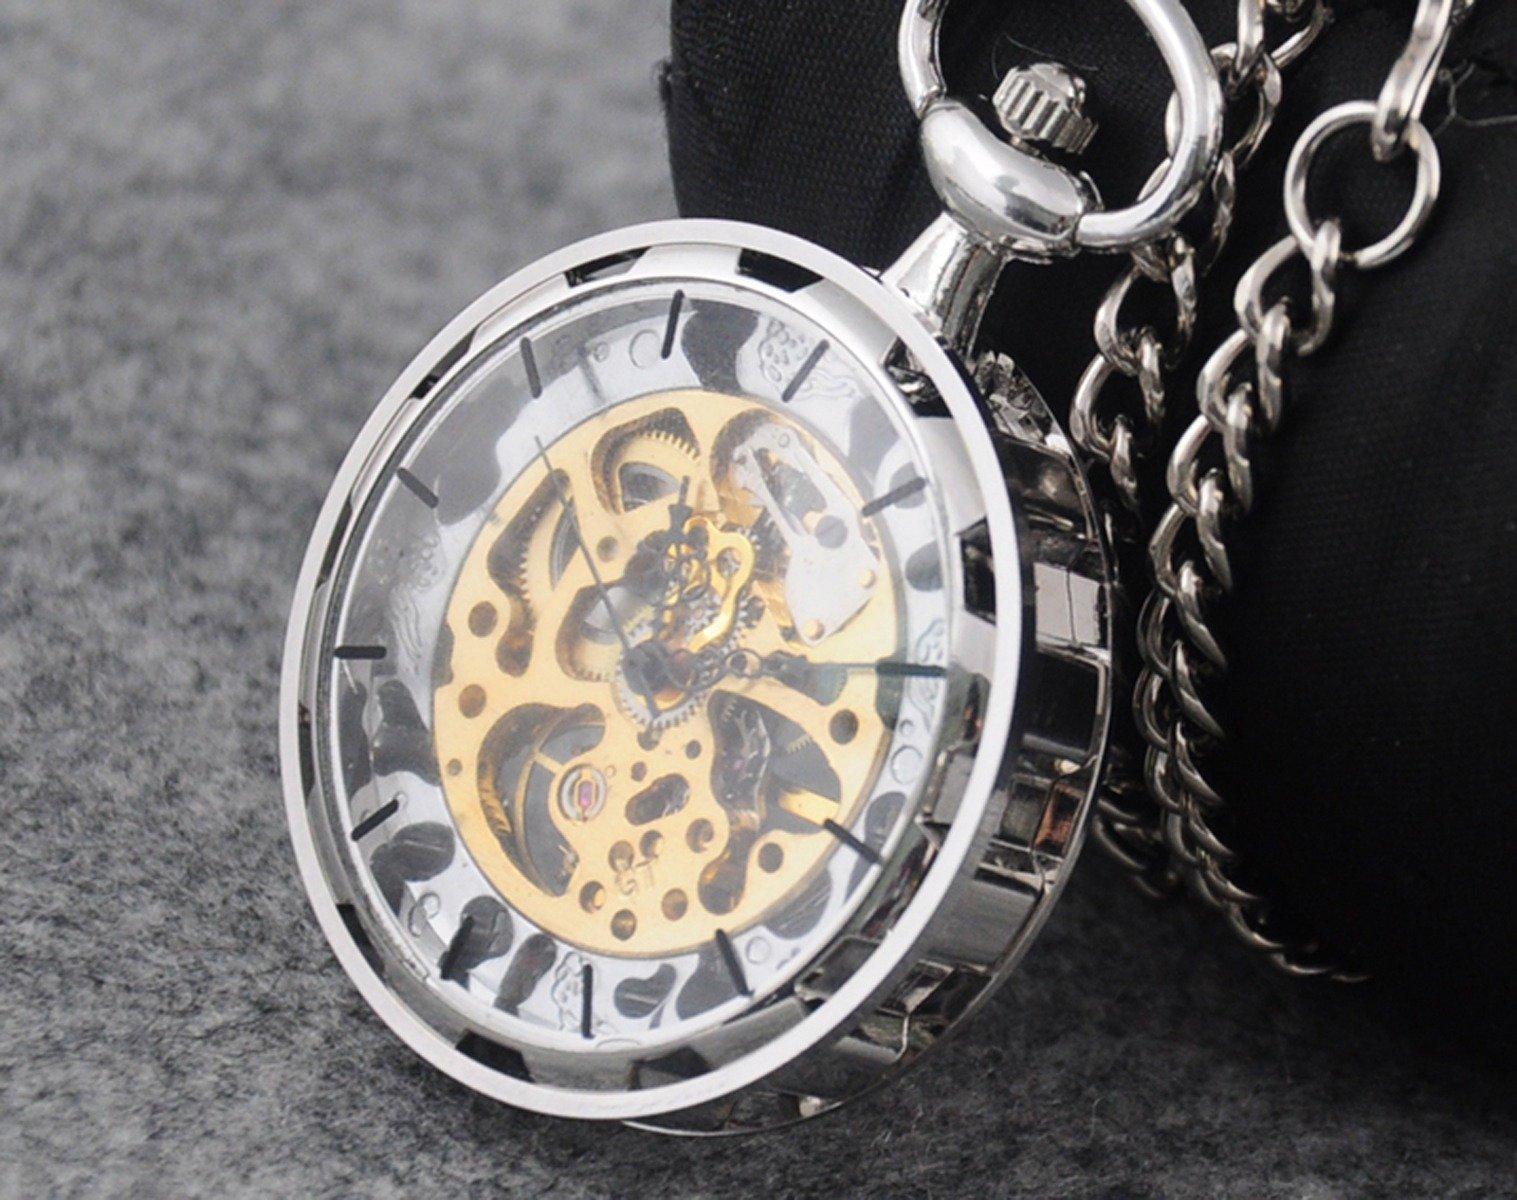 VIGOROSO Mens Classic Steampunk Gold Skeleton Hand Wind Mechanical Pocket Watch by VIGOROSO (Image #4)